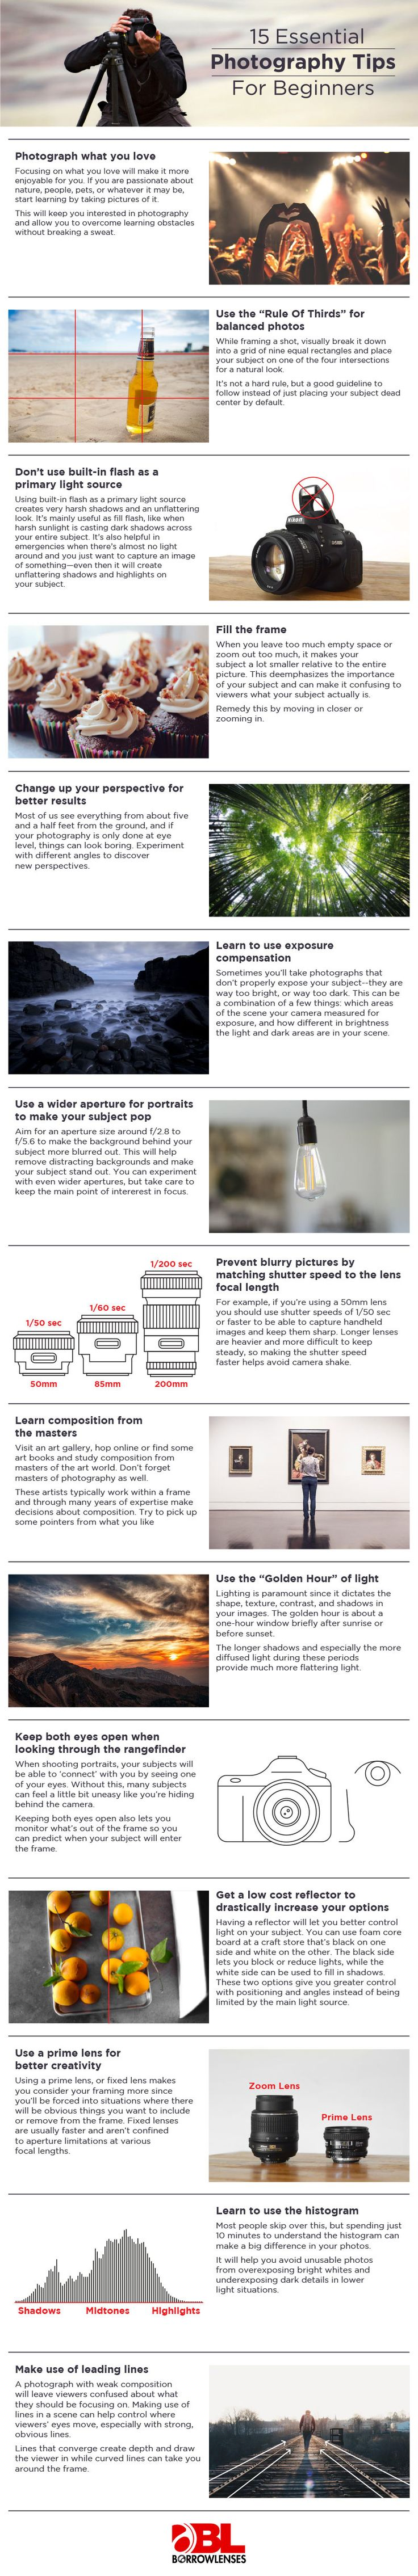 22 digital photo frame Understanding How Copyright Works on Flickr - The Spruce Crafts